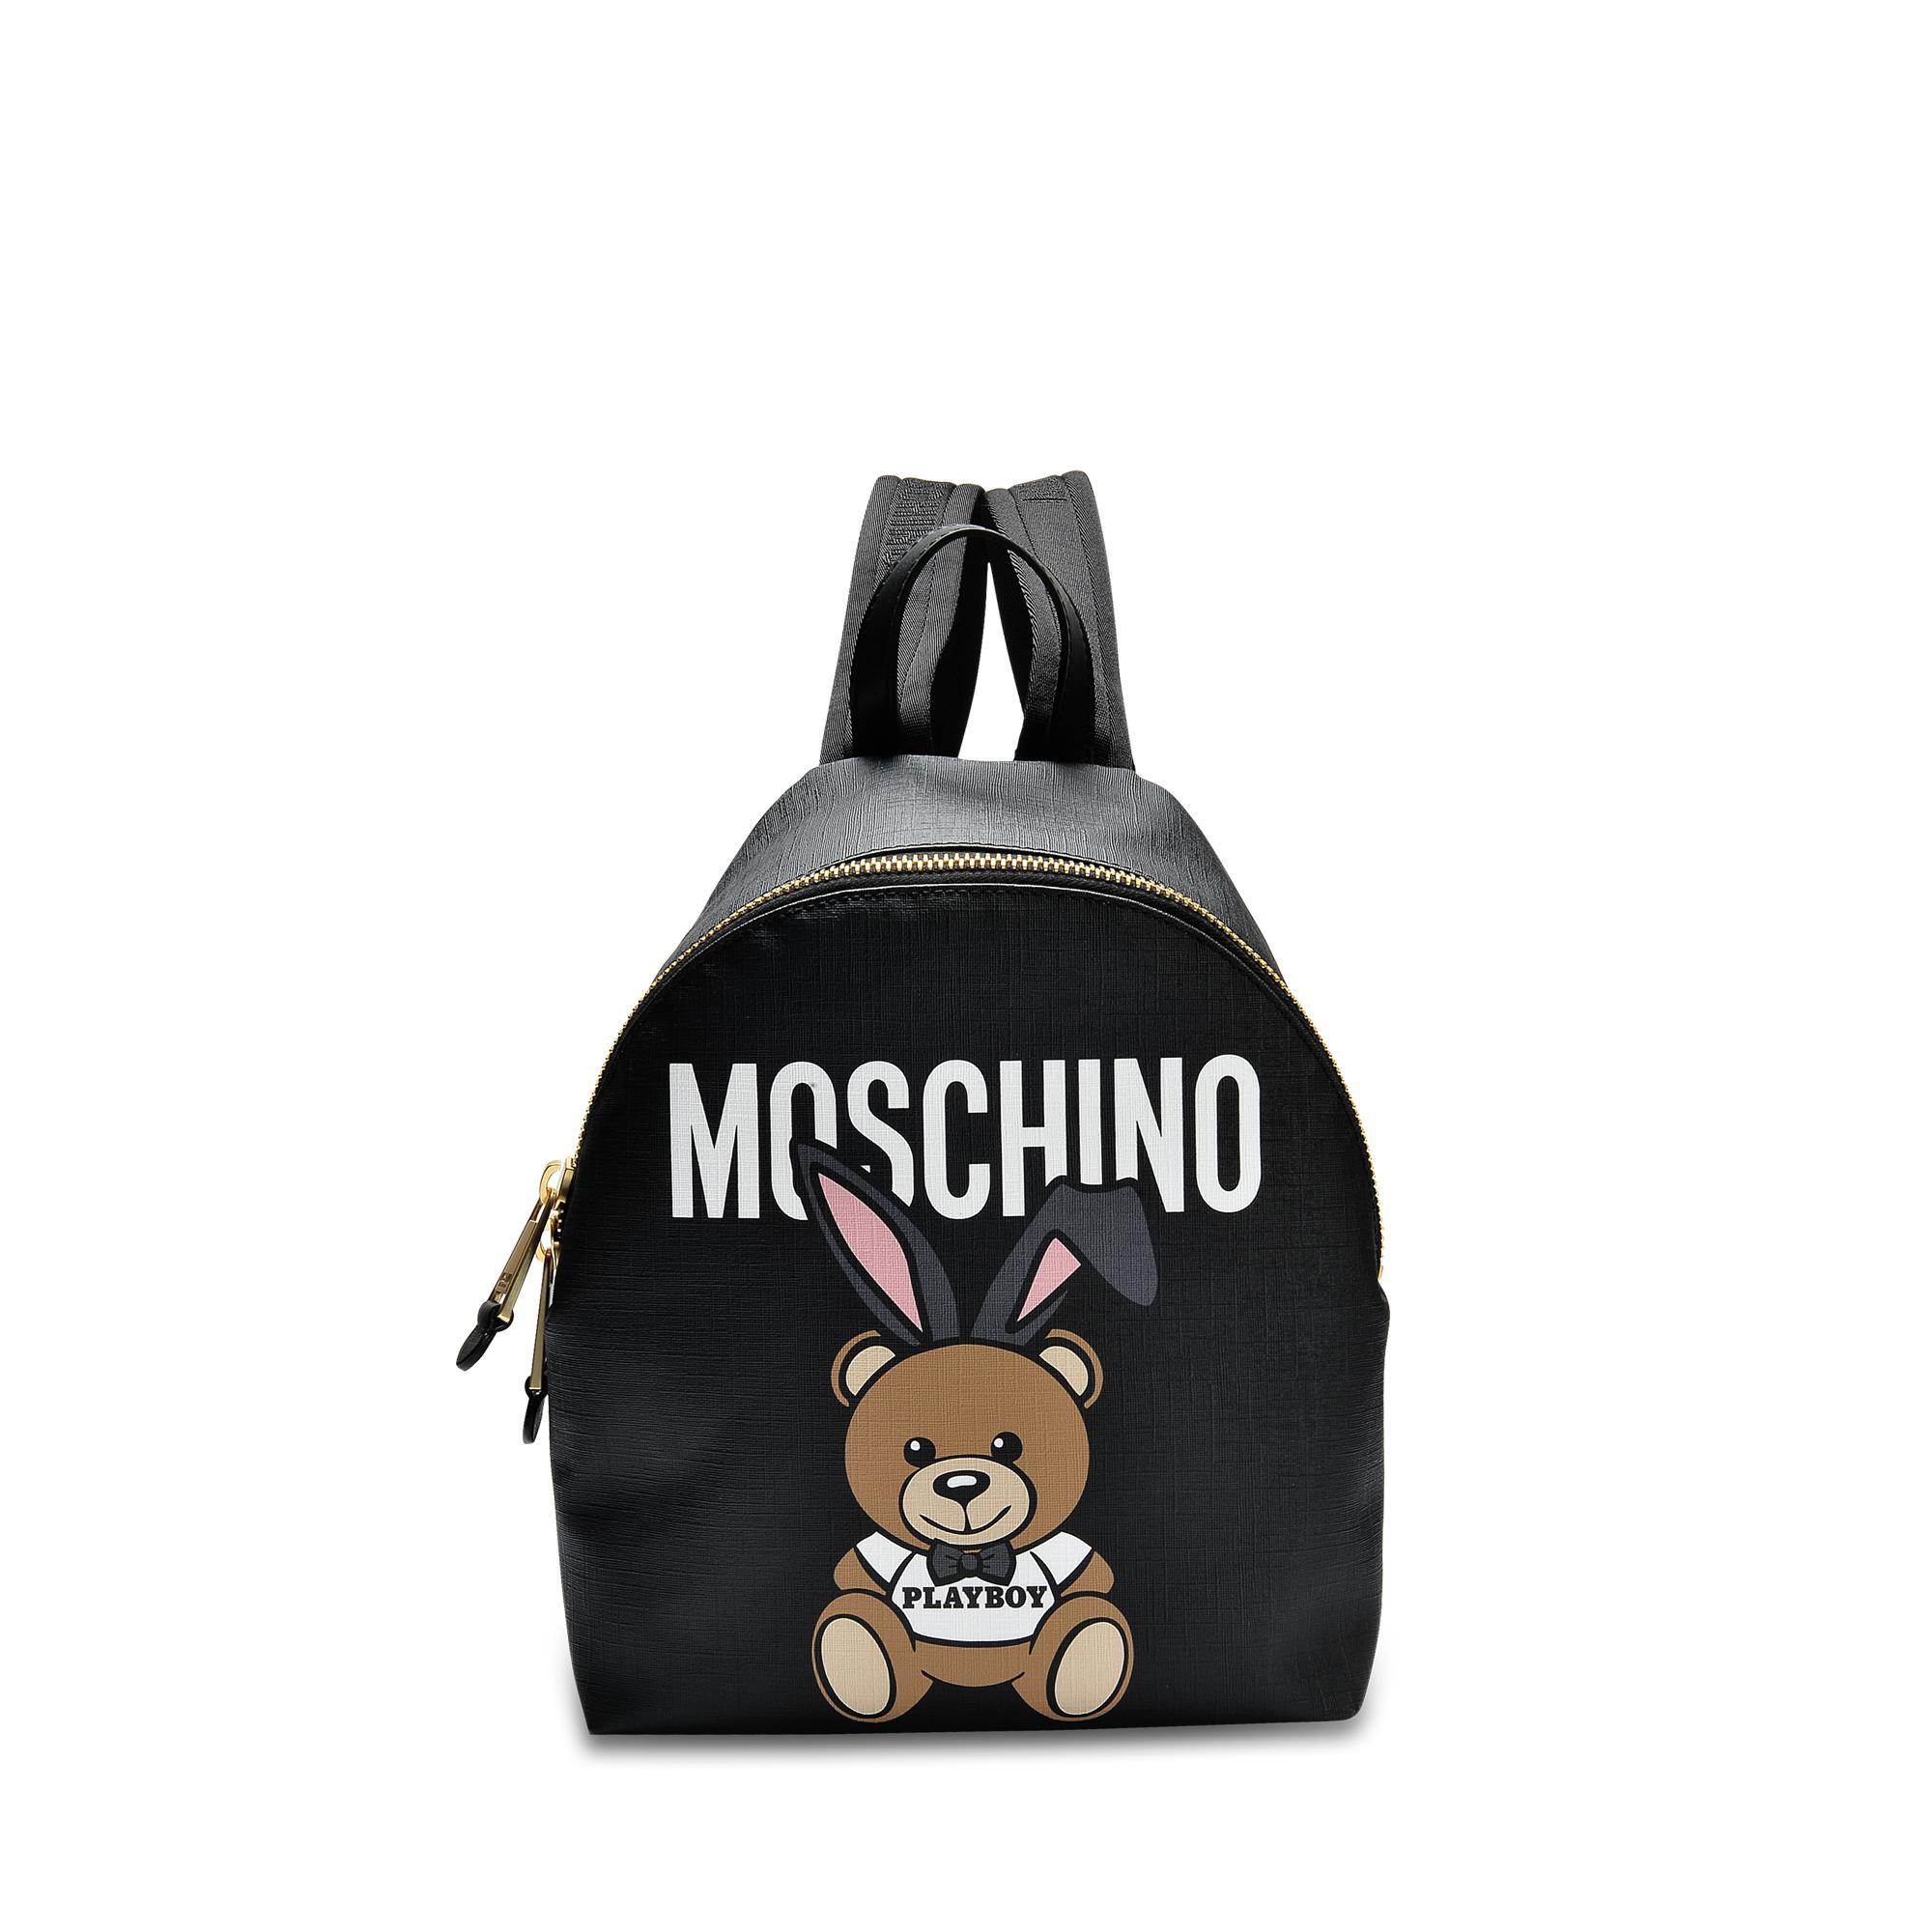 Moschino Petit Sac à Dos Teddy Playboy en Saffiano Noir KM9EzplU